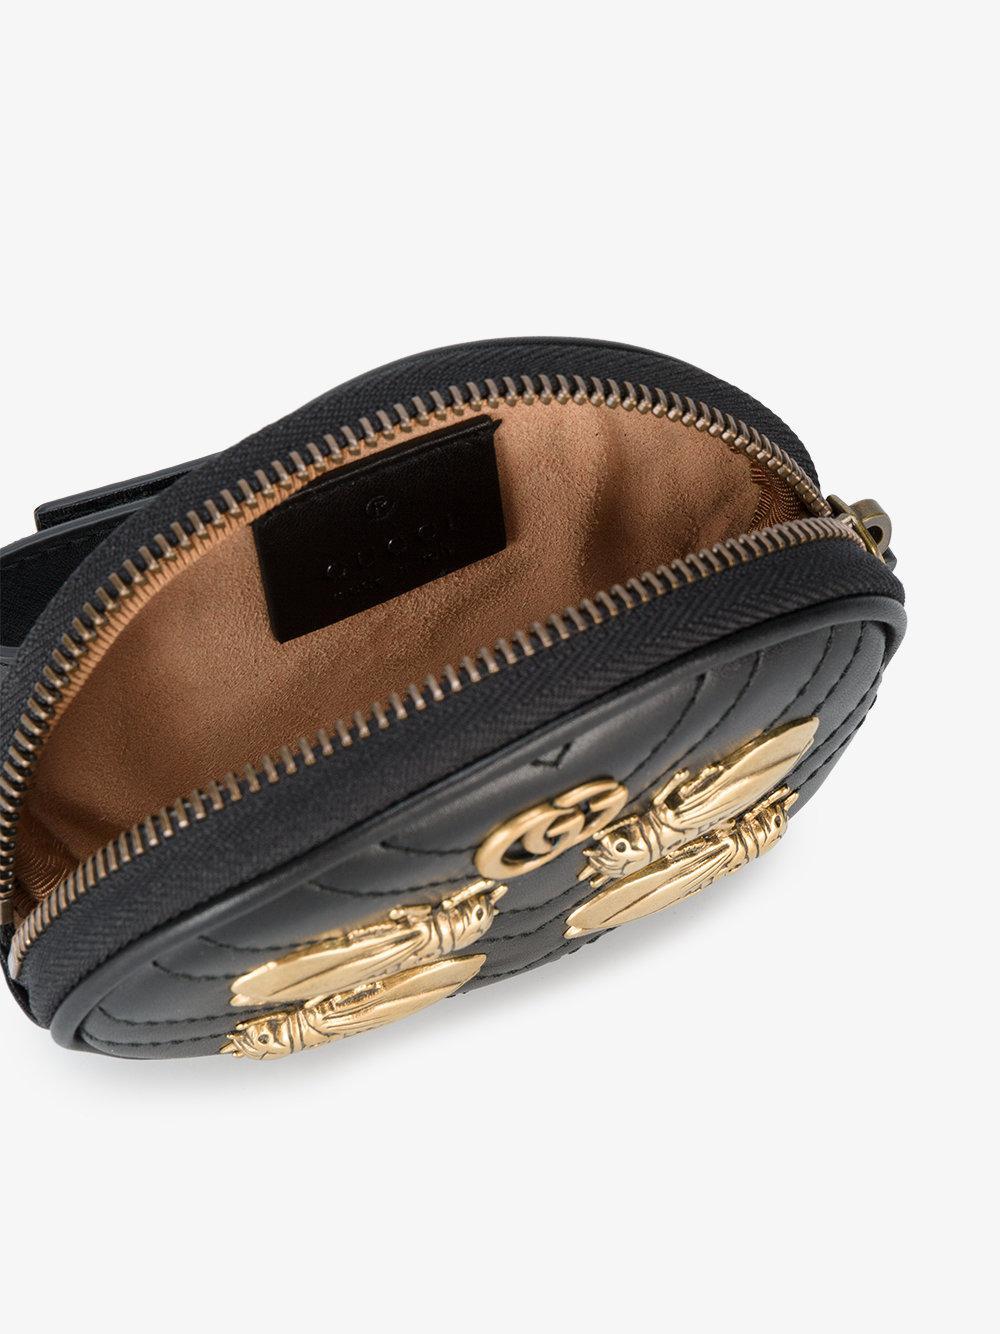 da8583faa15001 Gucci Marmont 2.0 Bee Embellished Purse in Black - Lyst